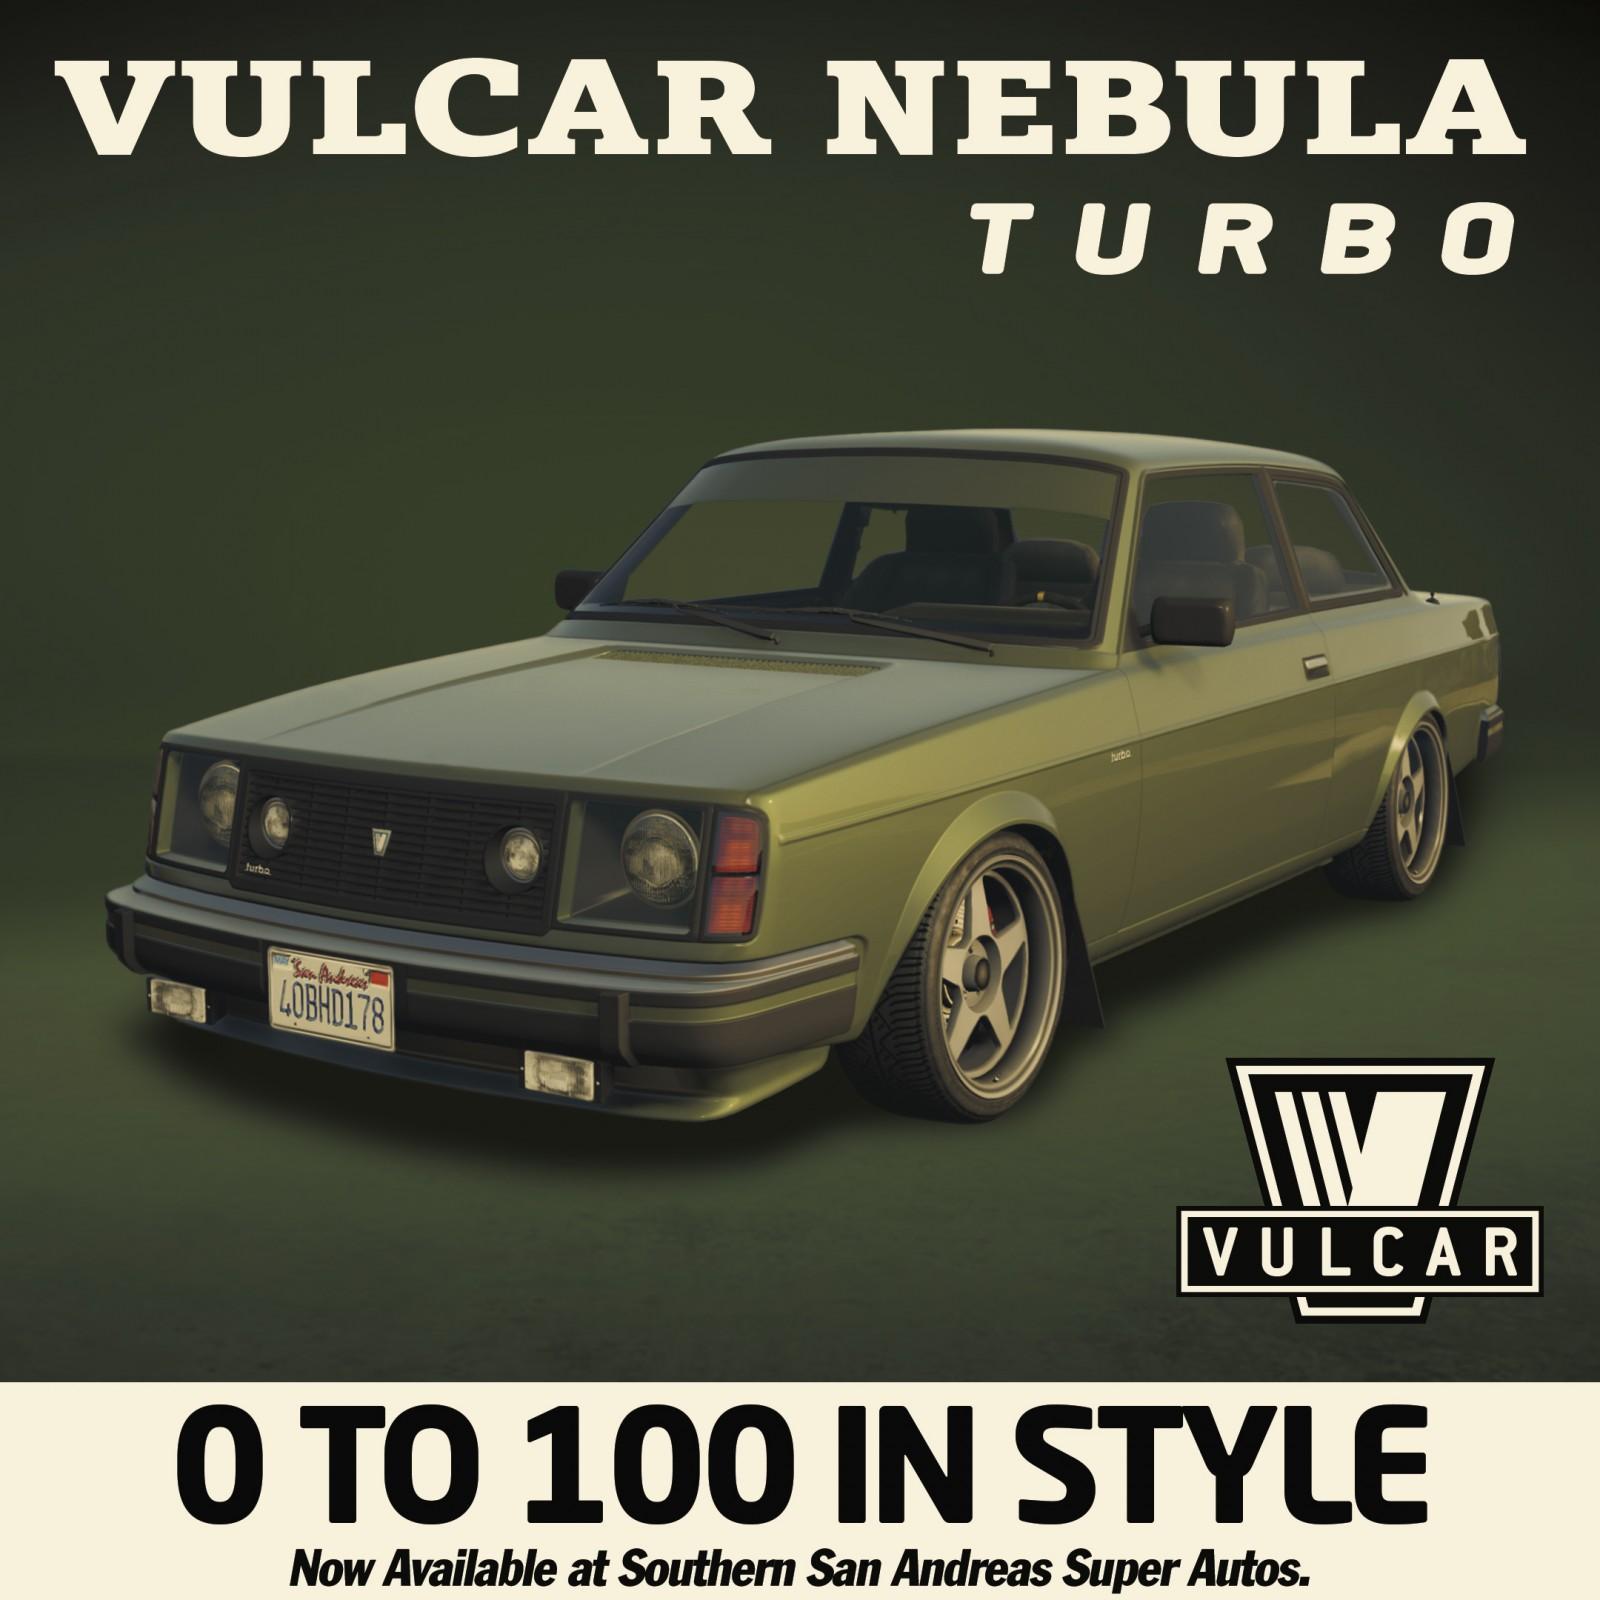 Nebula Turbo - GTA V Vehicles Database & Statistics - Grand